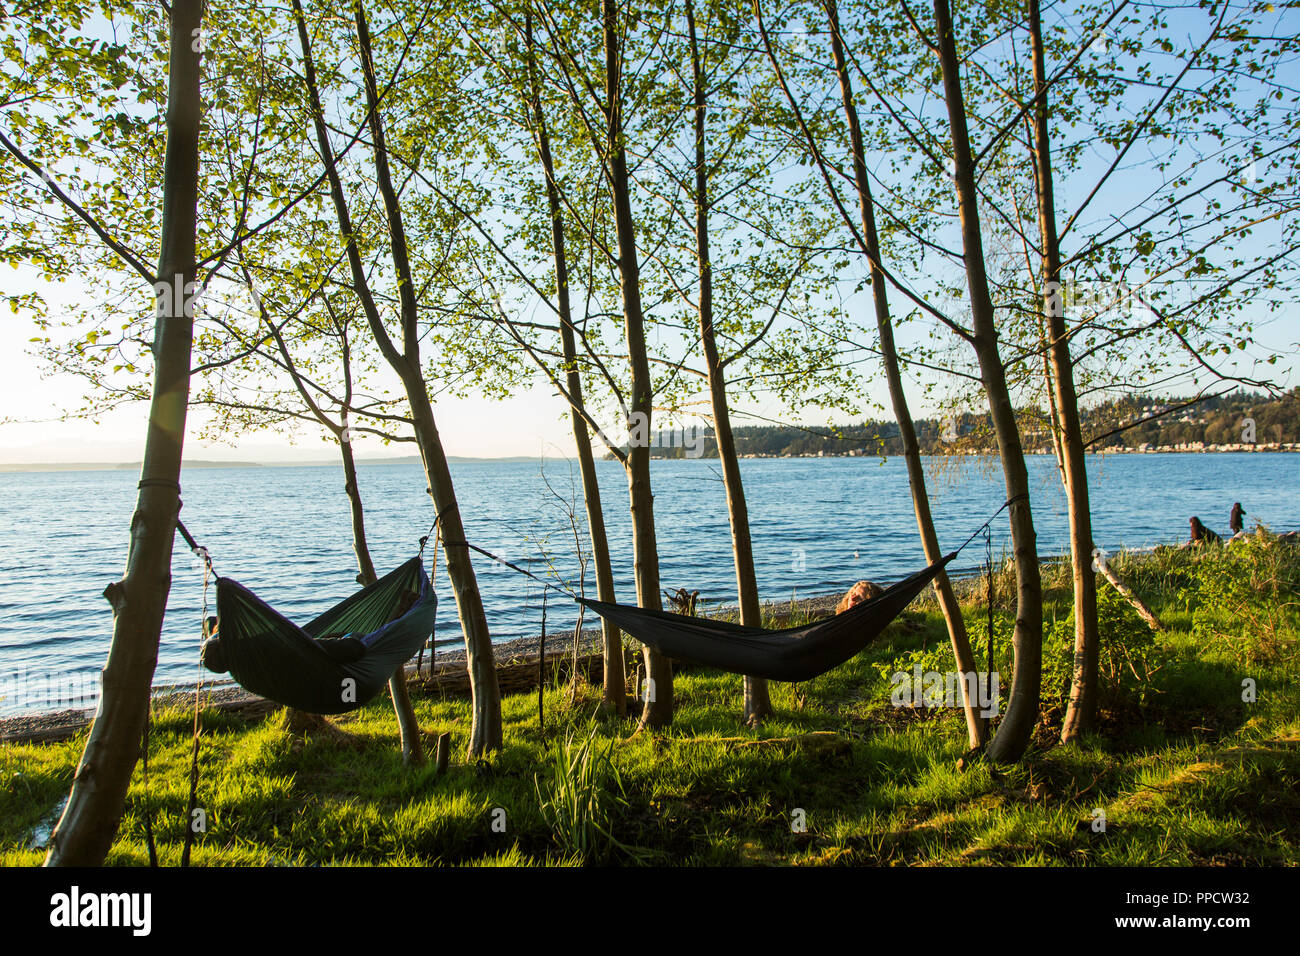 Two women relaxing in hammocks on coast, Seattle, Washington, USA - Stock Image